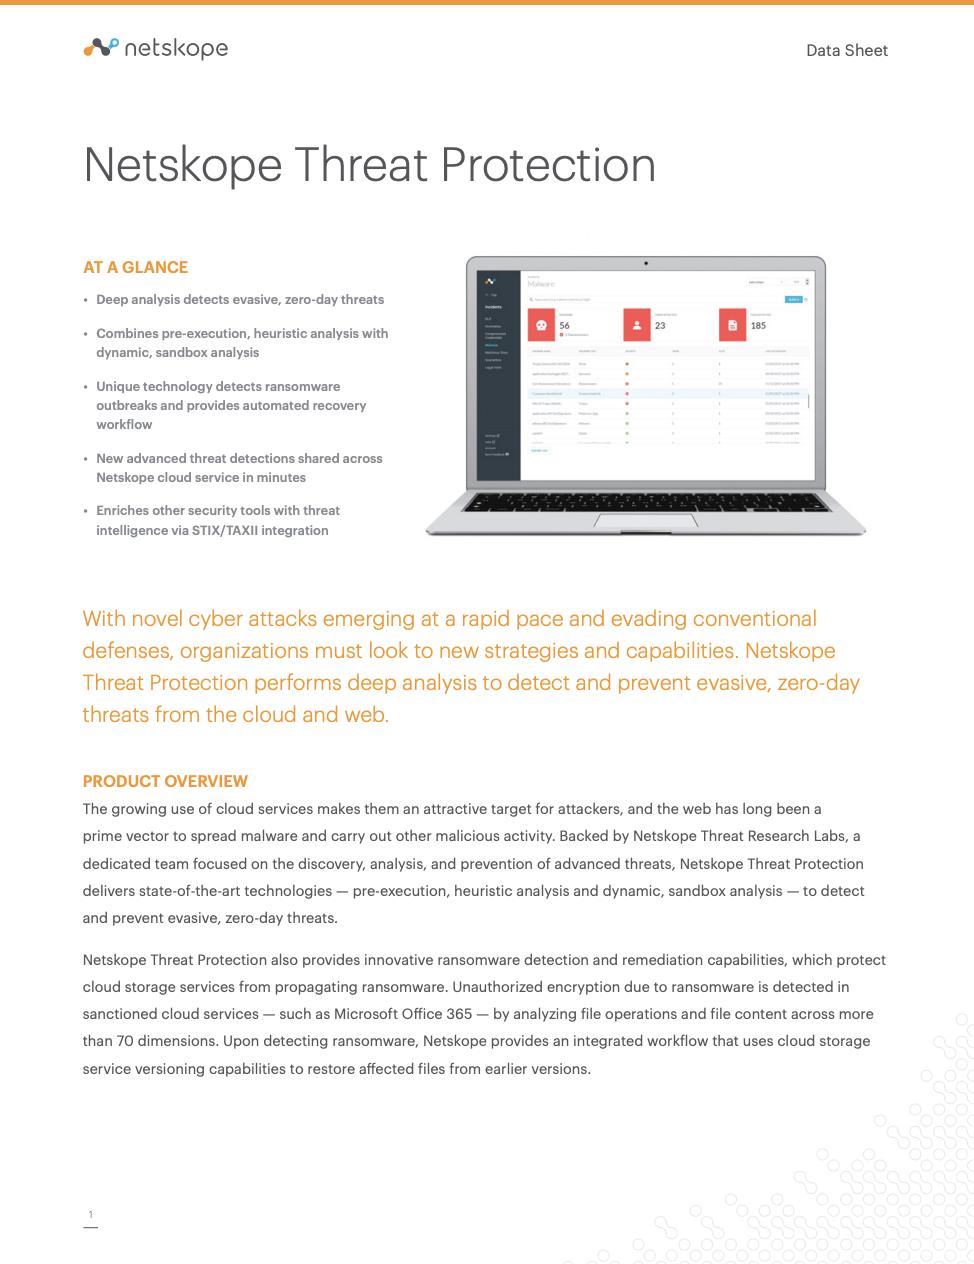 Netskope Threat Protection